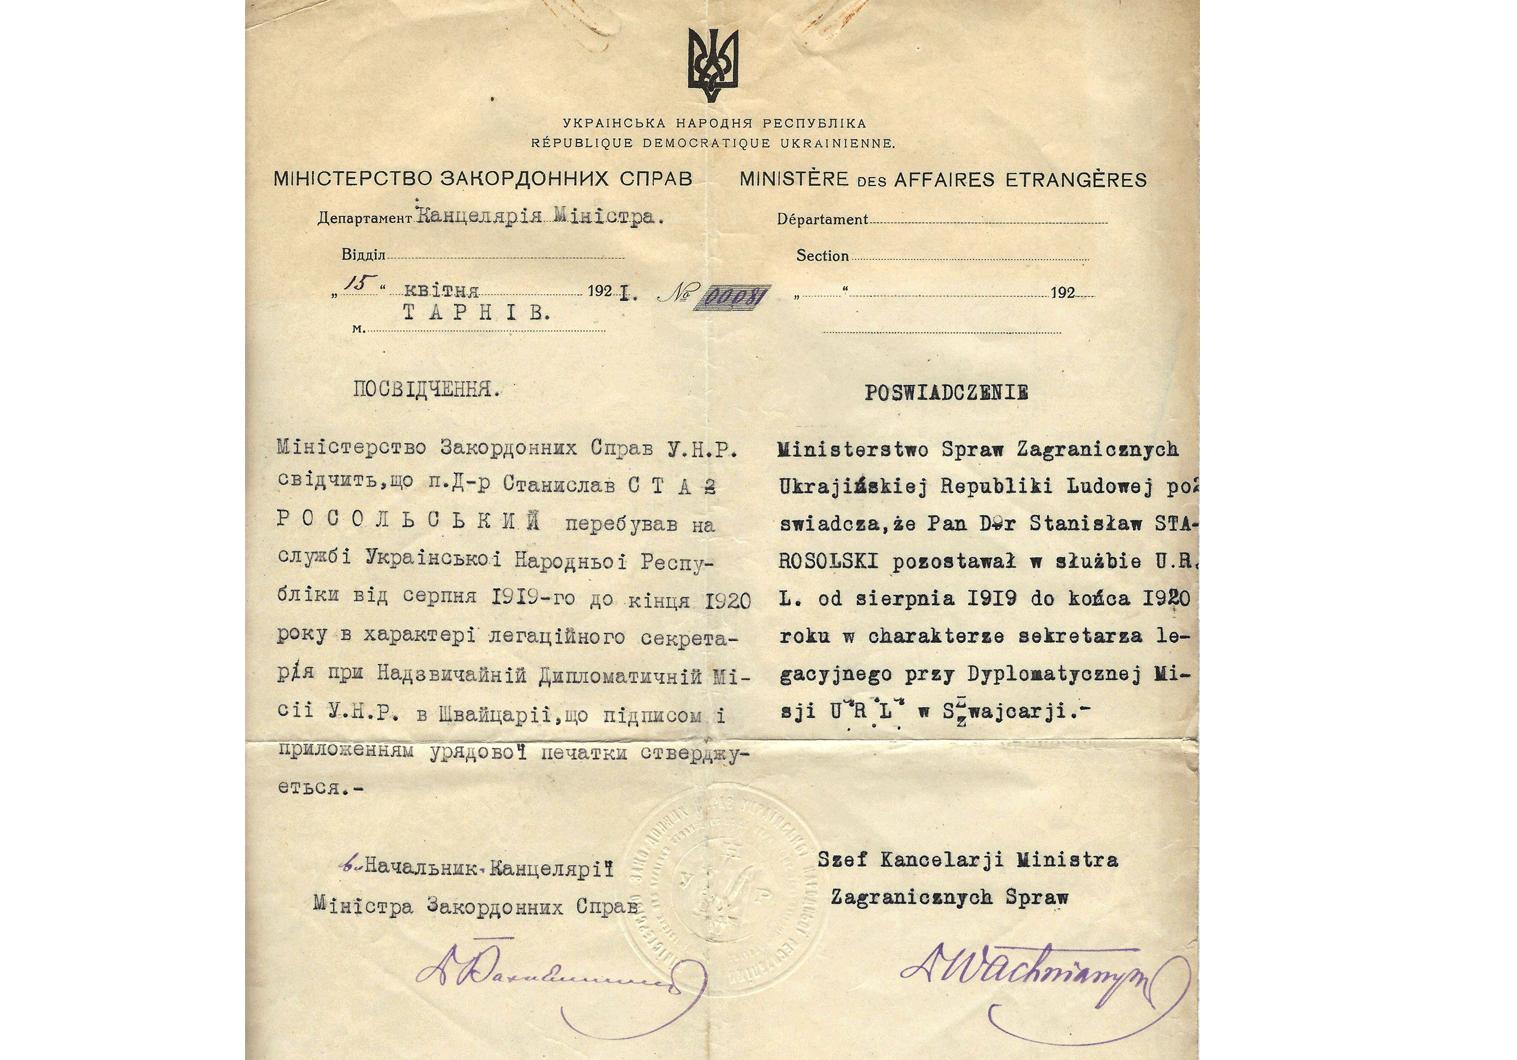 Ukrainian National Republic